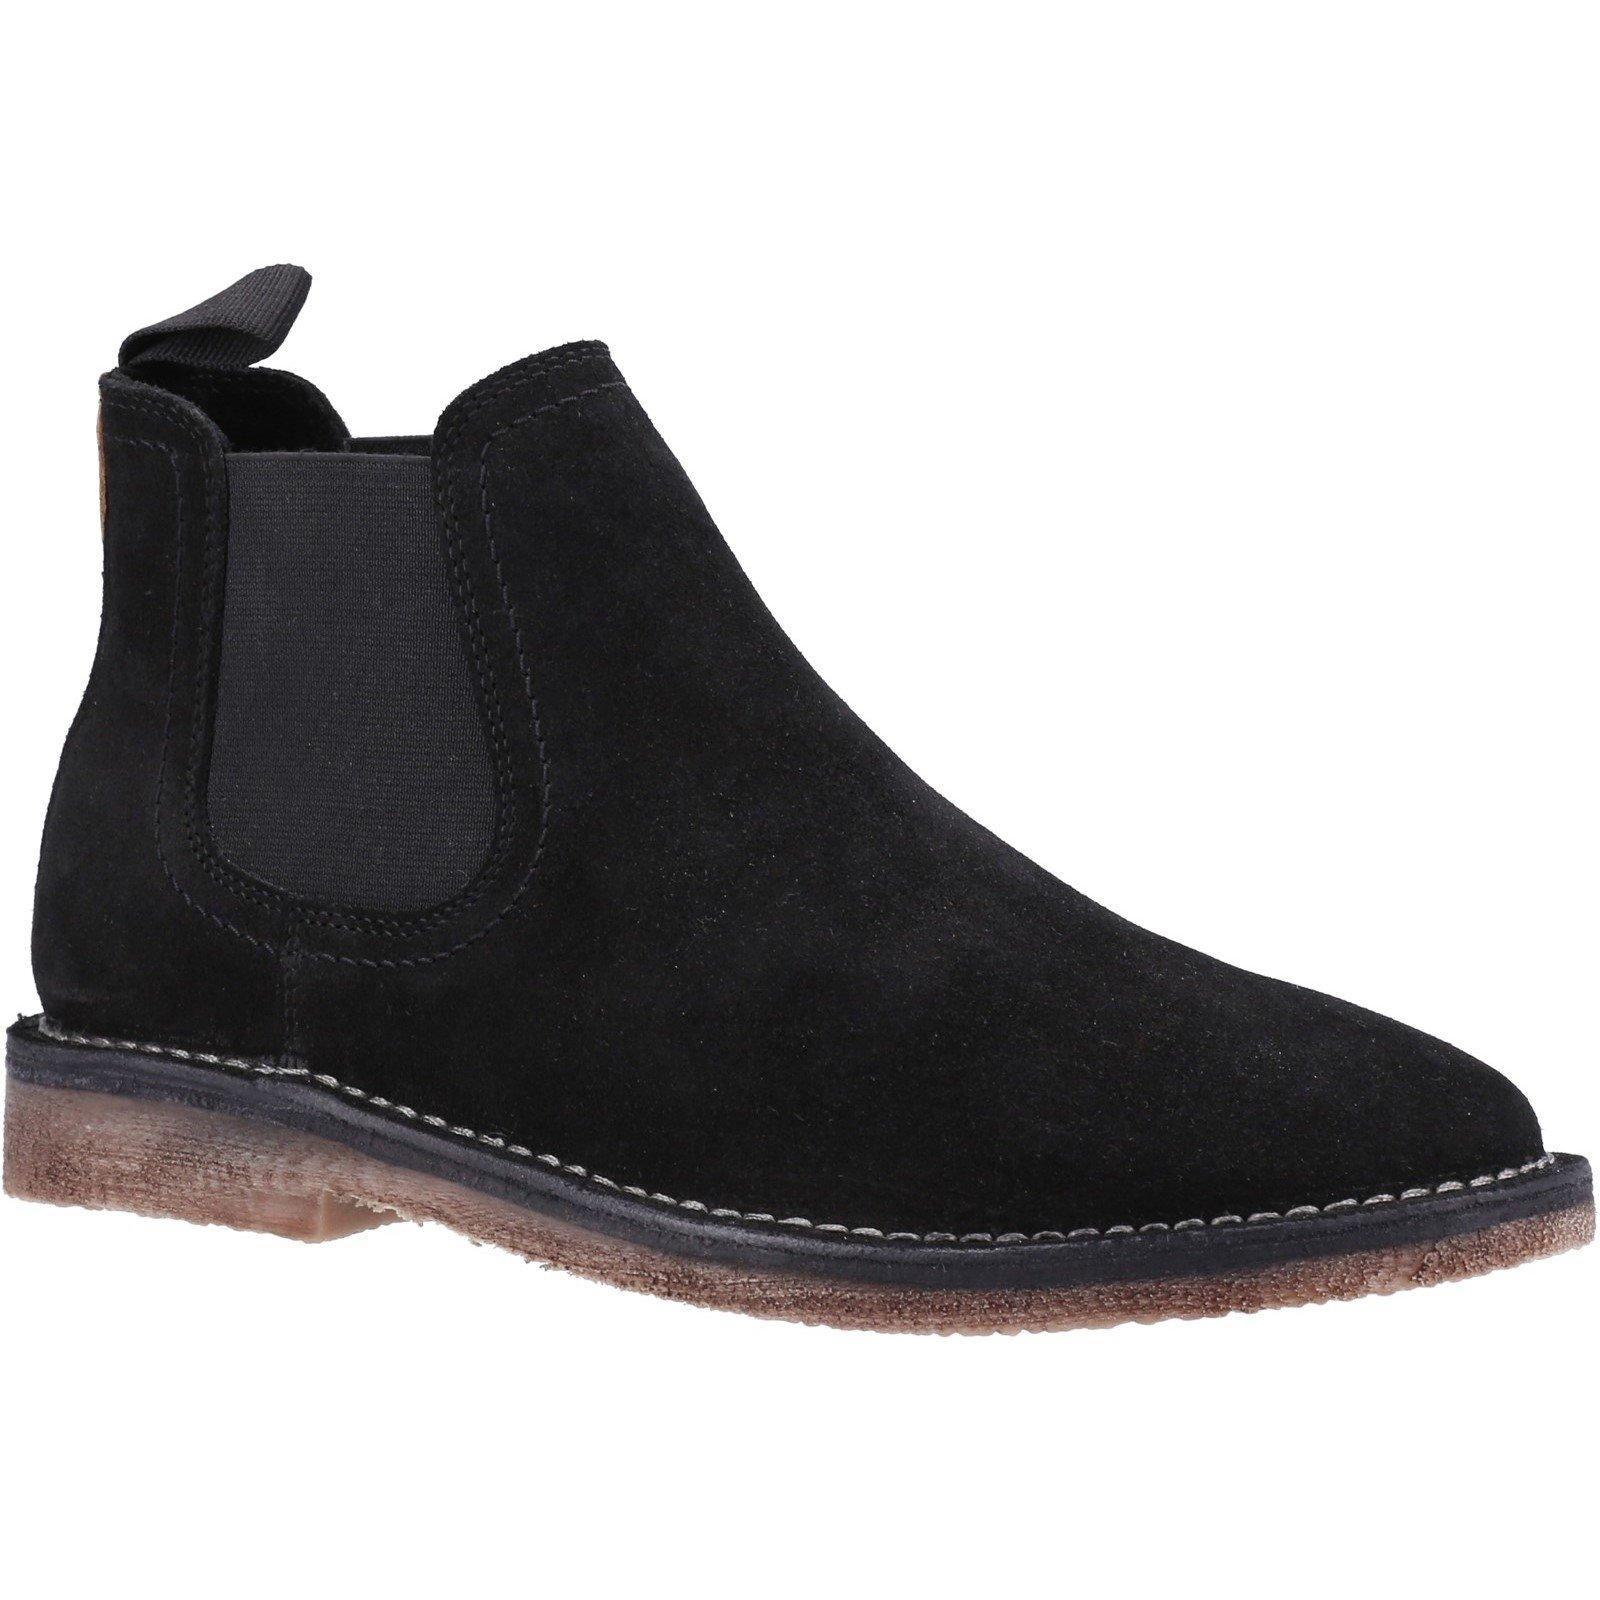 Hush Puppies Men's Shaun Leather Chelsea Boot Various Colours 32897 - Black 12